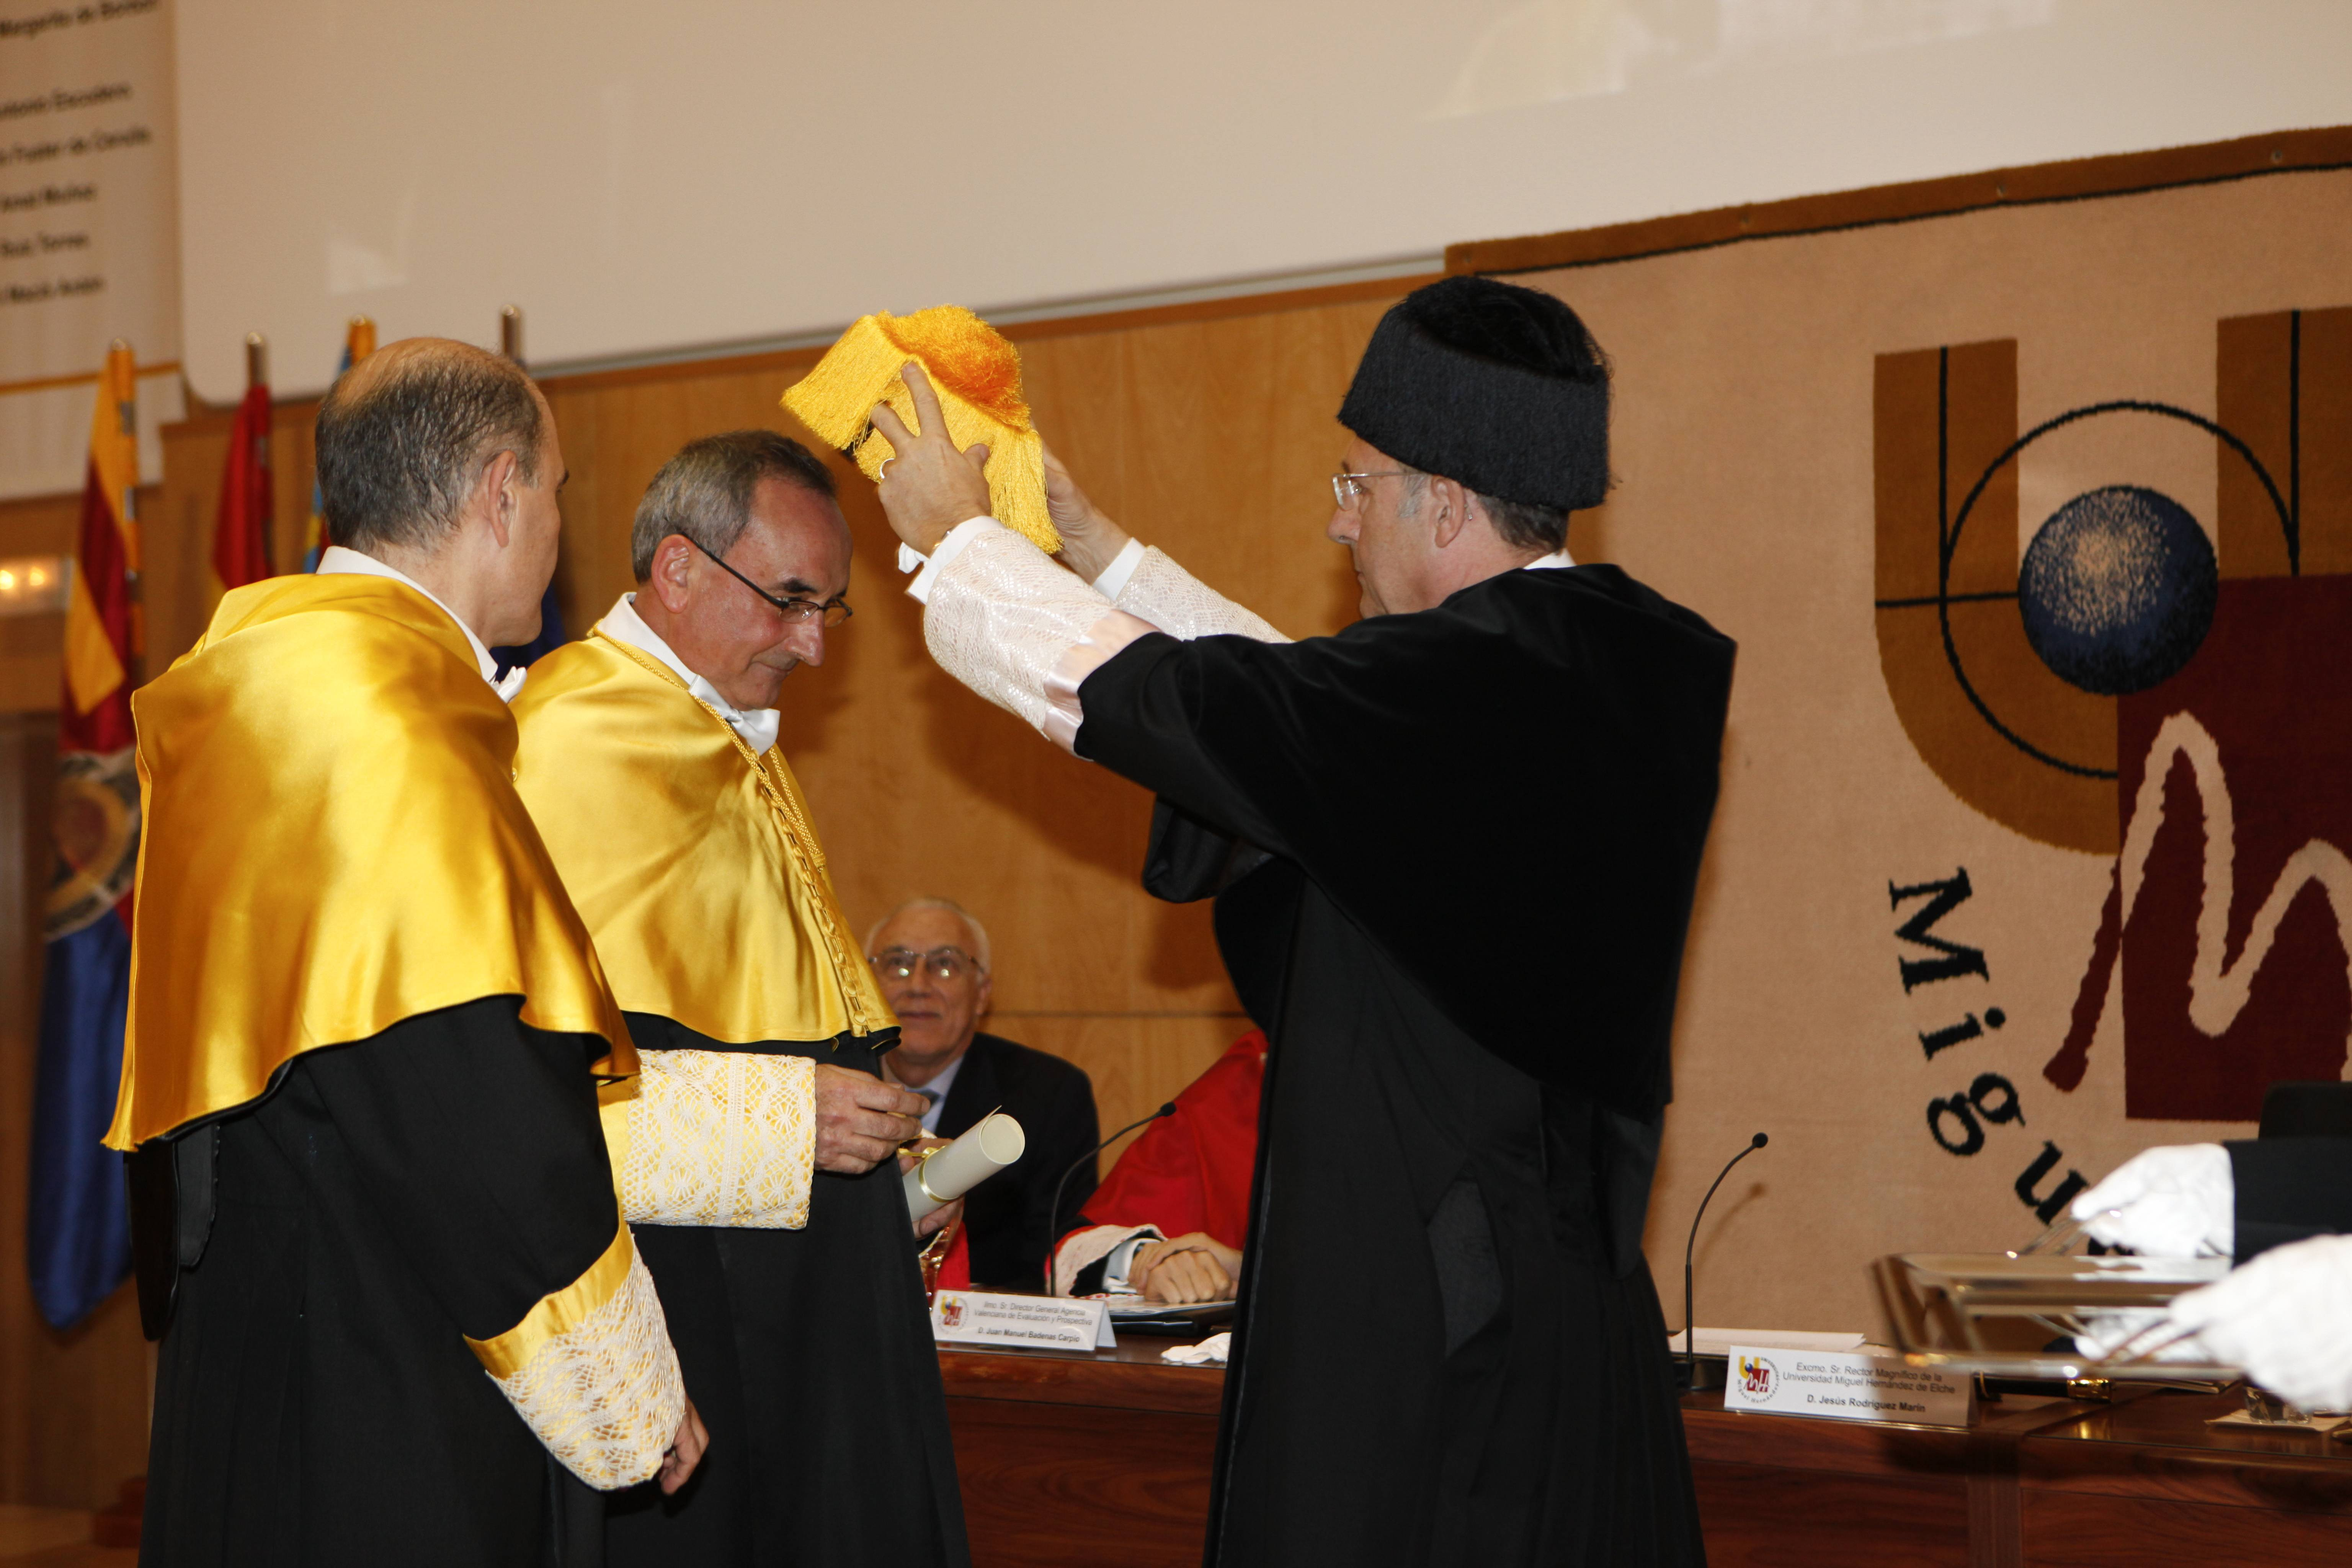 doctor-honoris-causa-luis-gamir_mg_1103.jpg